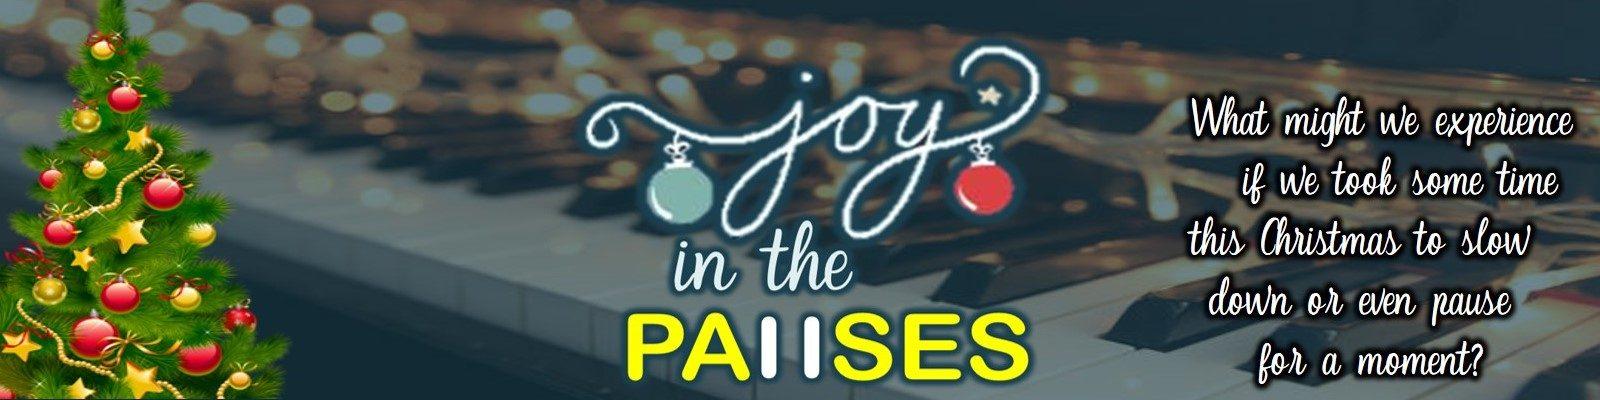 Kids Church Handout for Sunday 20 Dec – Advent 4